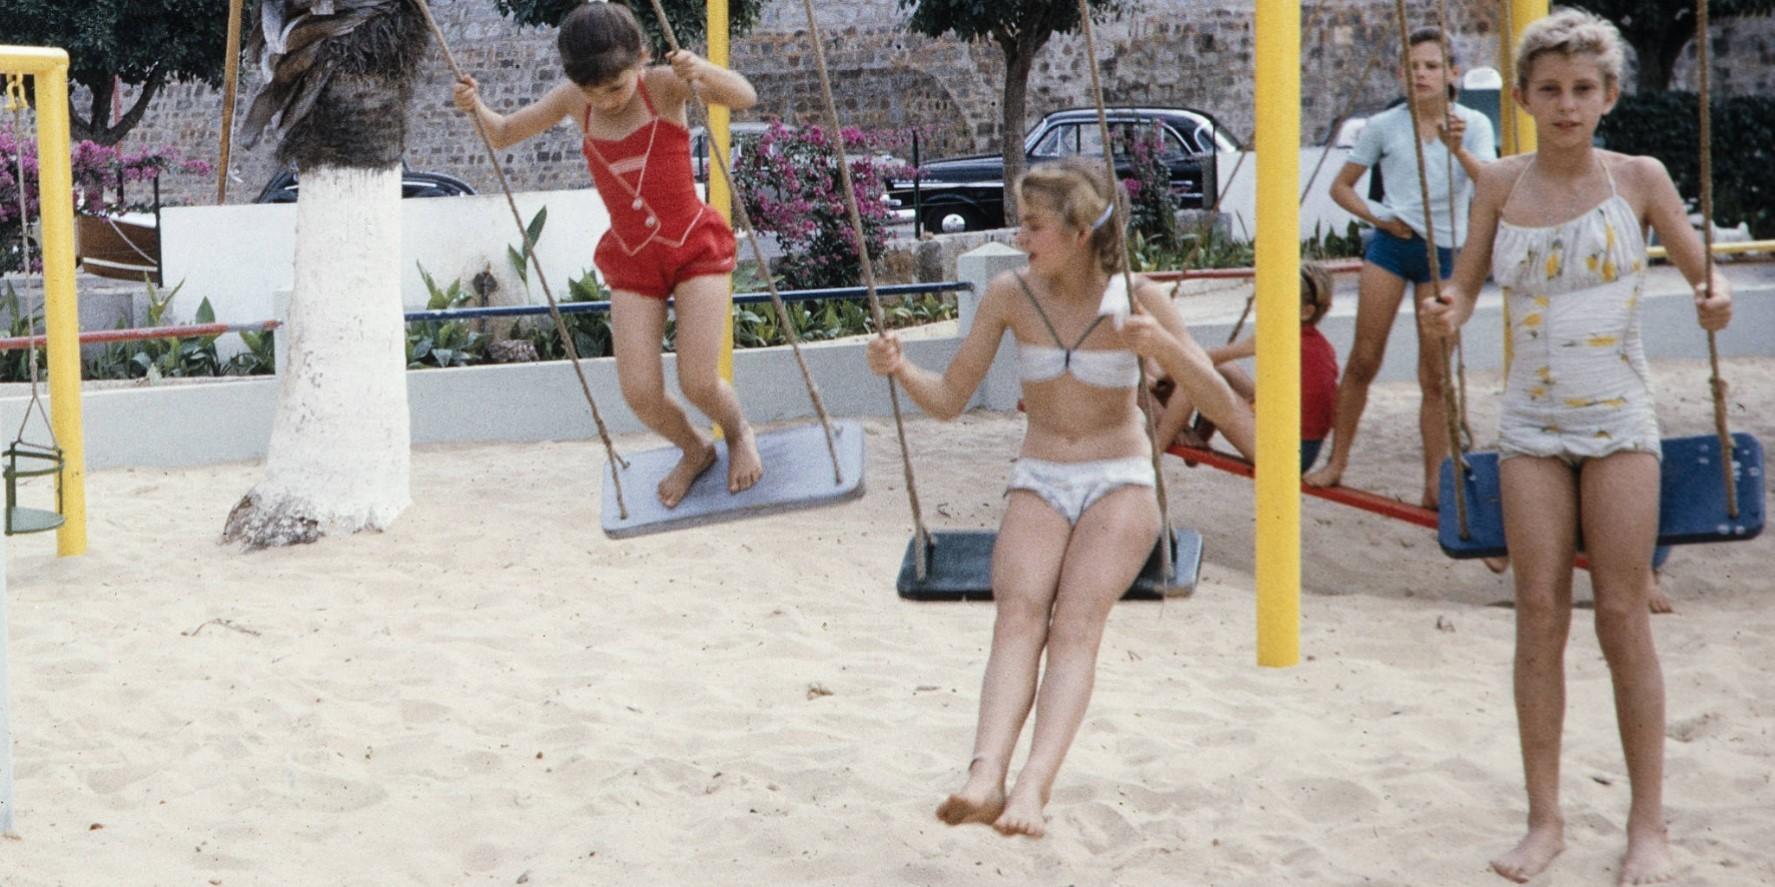 Дети в морскому клубе Мапуто (Лоренсу-Маркиш). Старое фото.